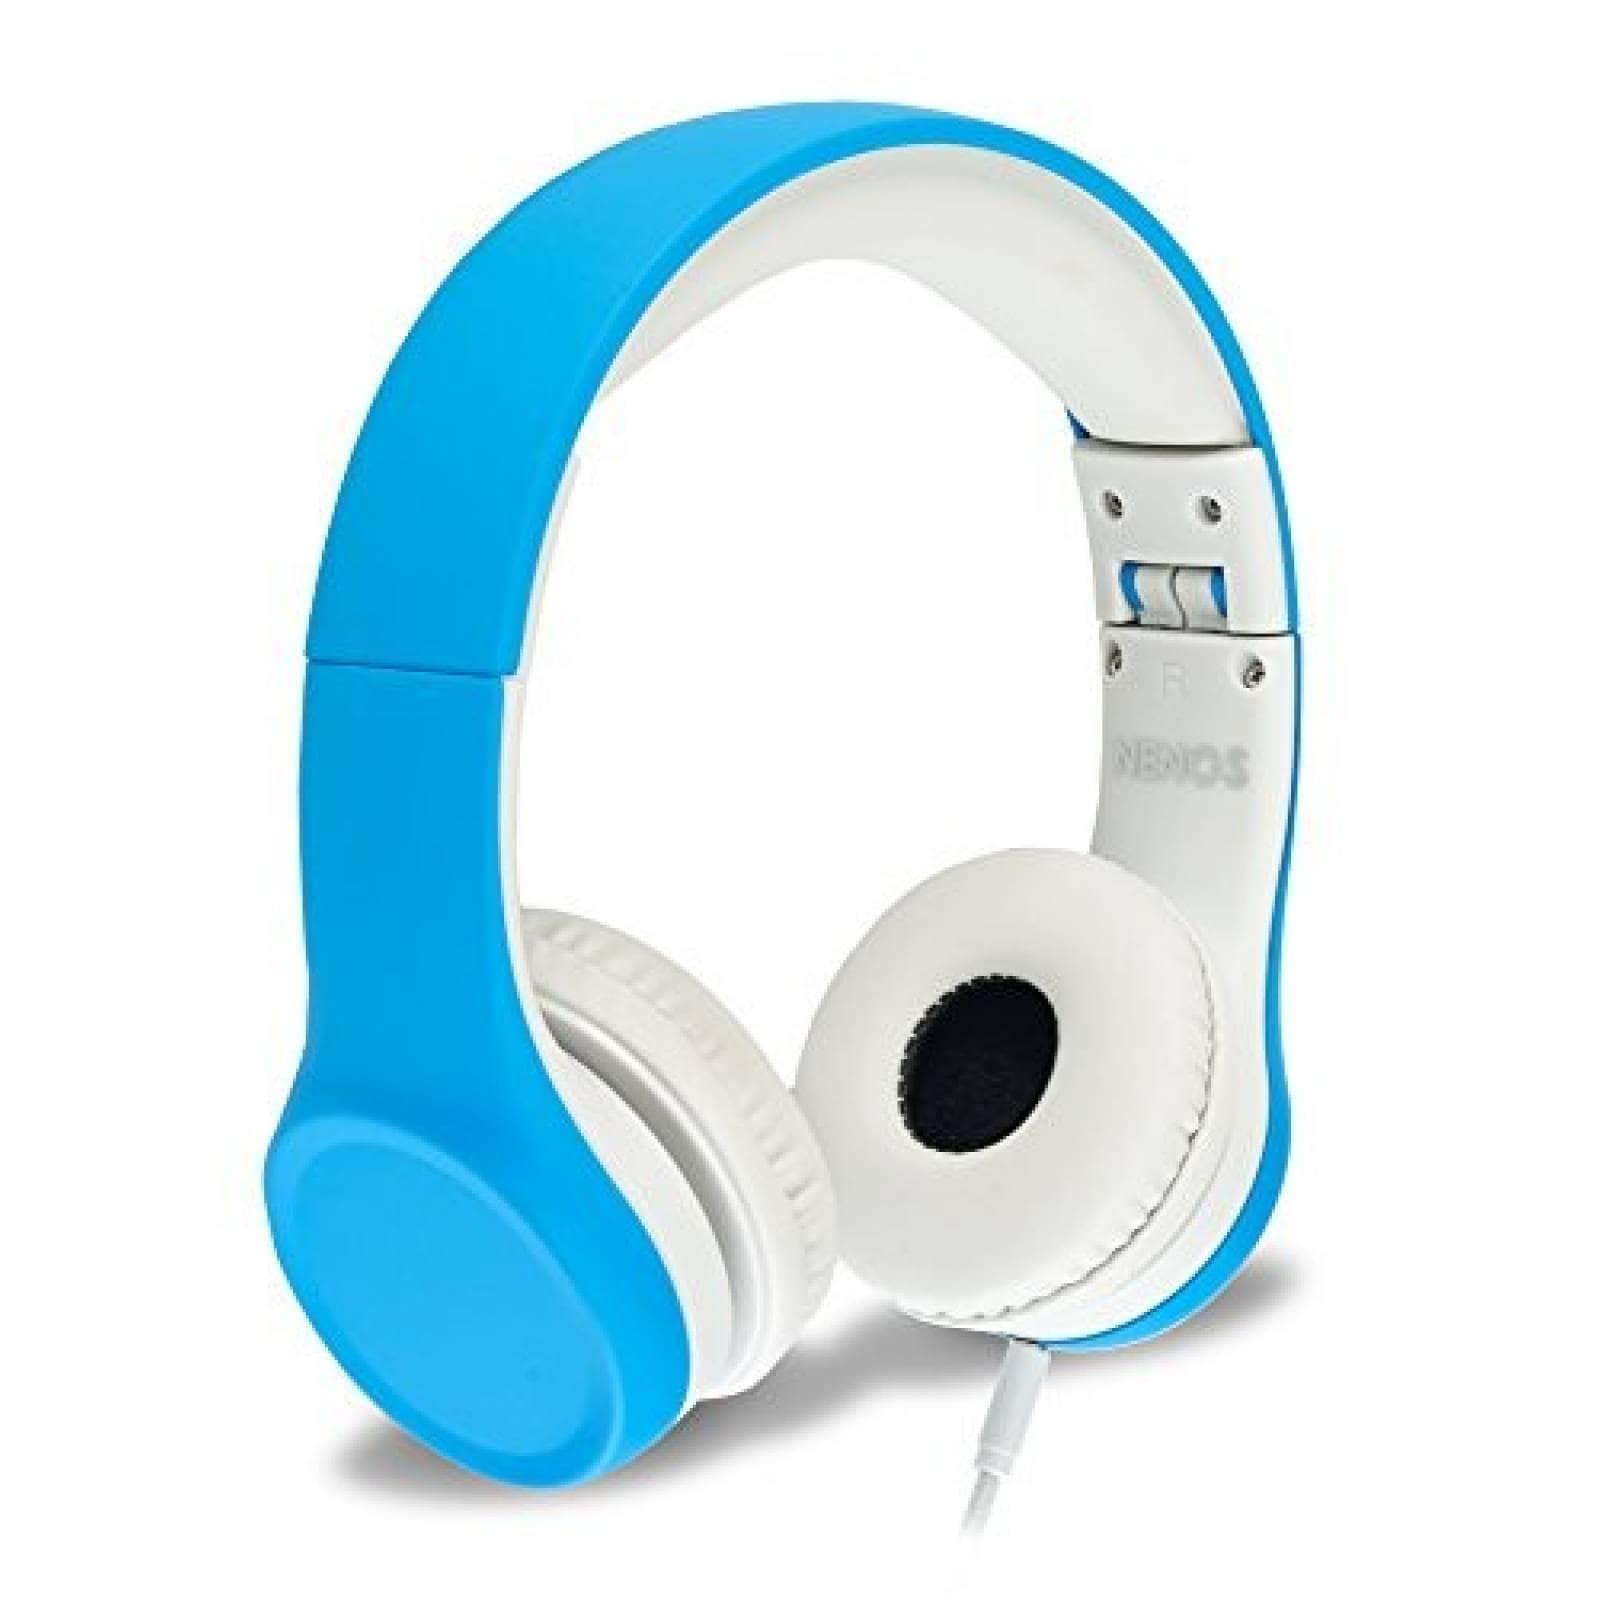 Audífonos de oído Nenos para niños límite volumen -Azul